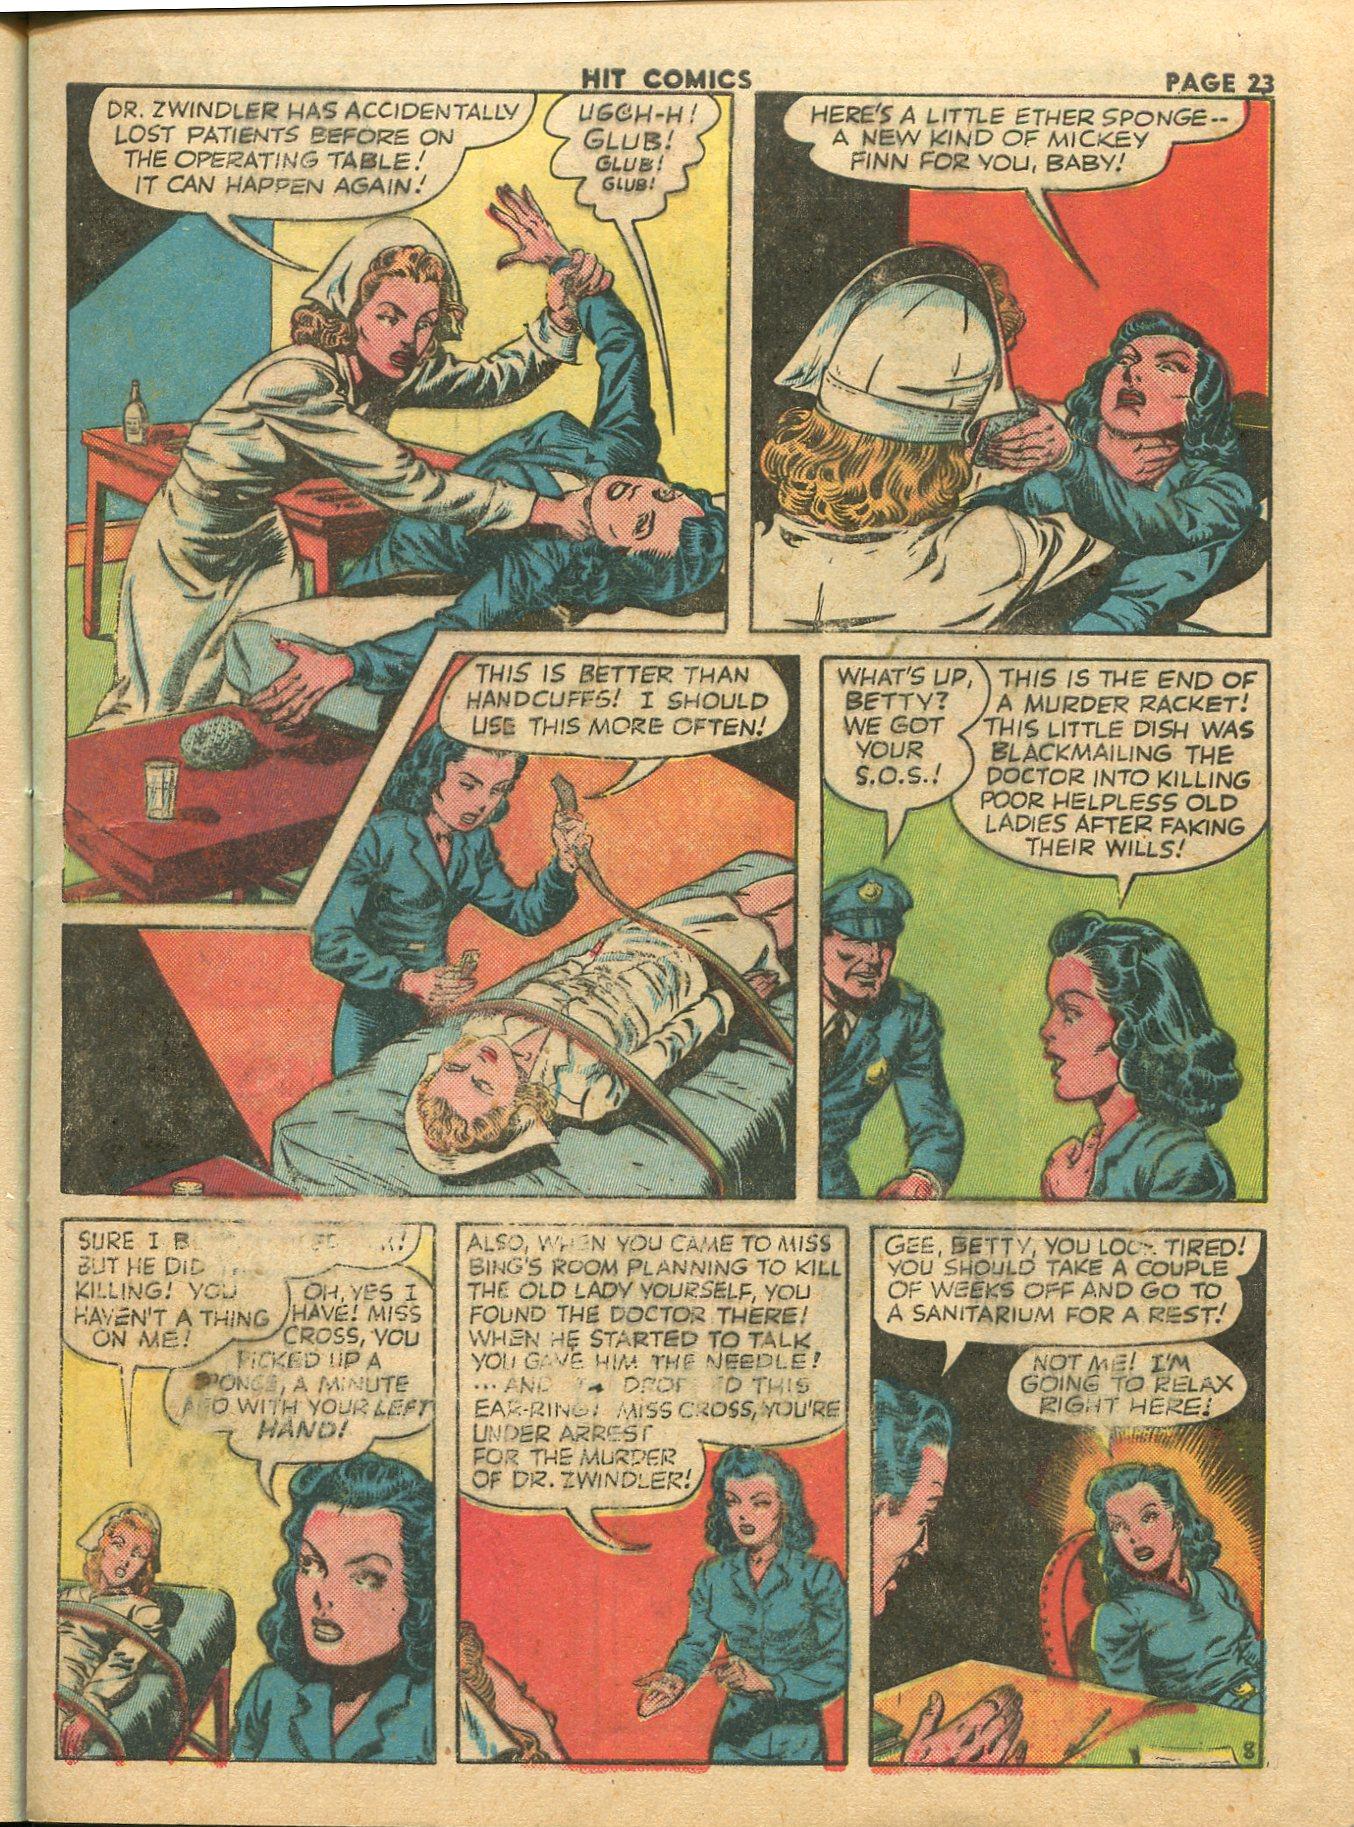 Read online Hit Comics comic -  Issue #28 - 26